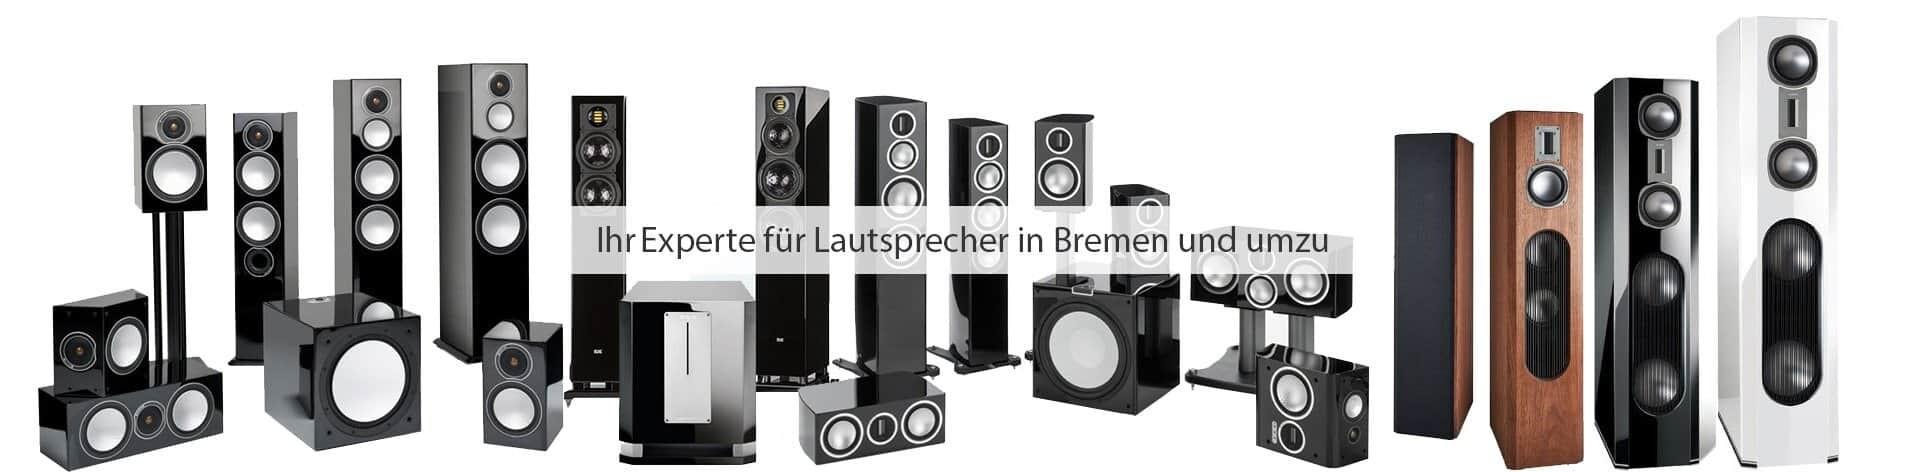 Lautsprecher Experte